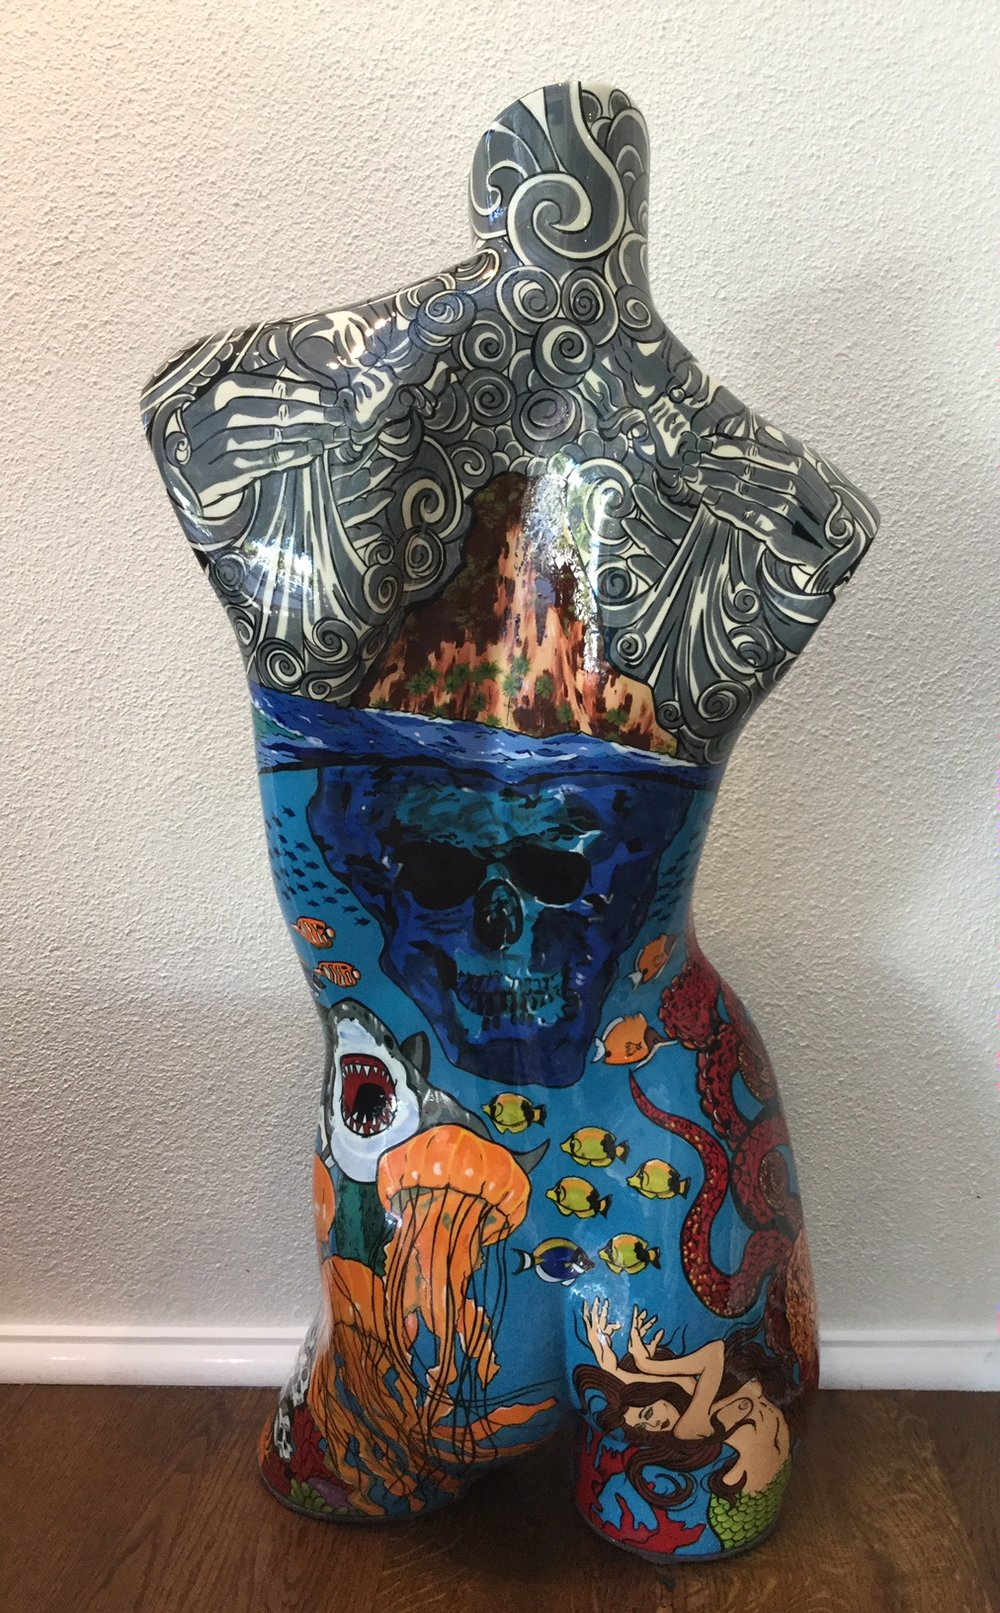 Poseidon Popart Bust back